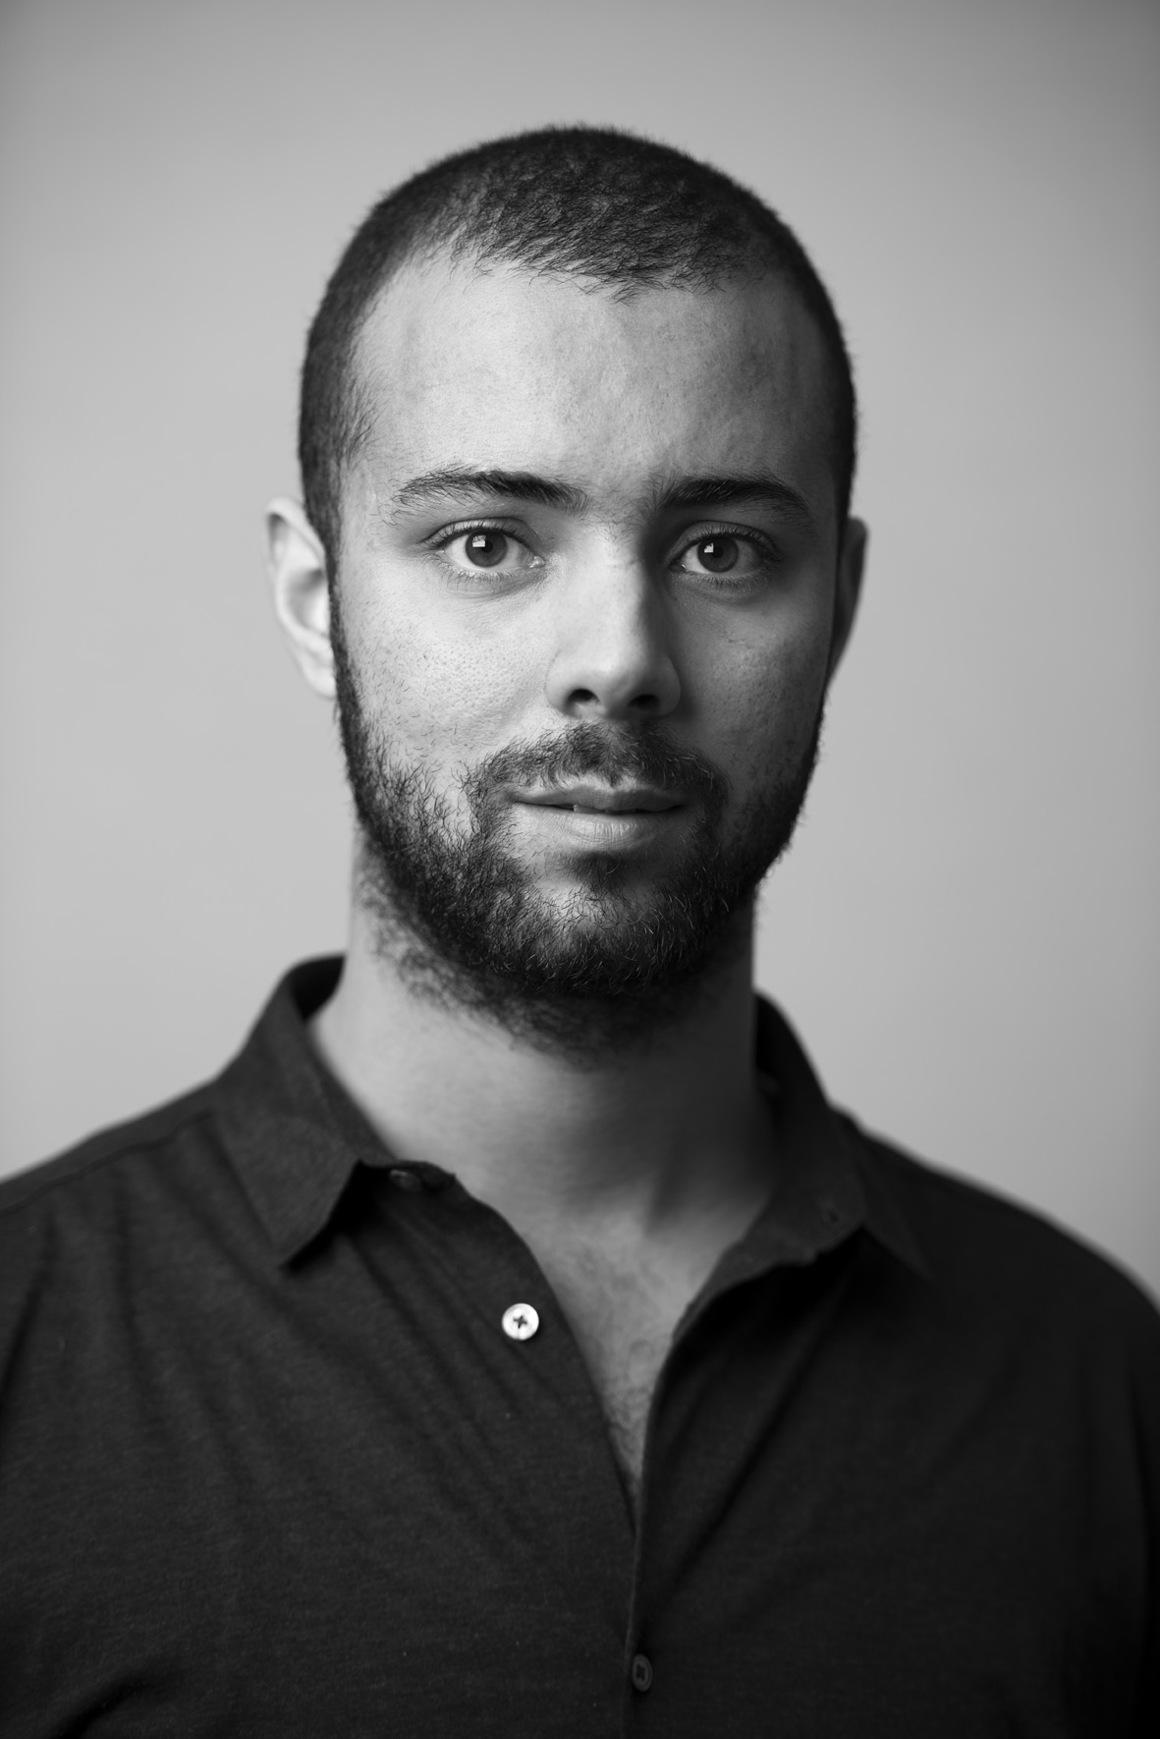 Alexander Salzberg